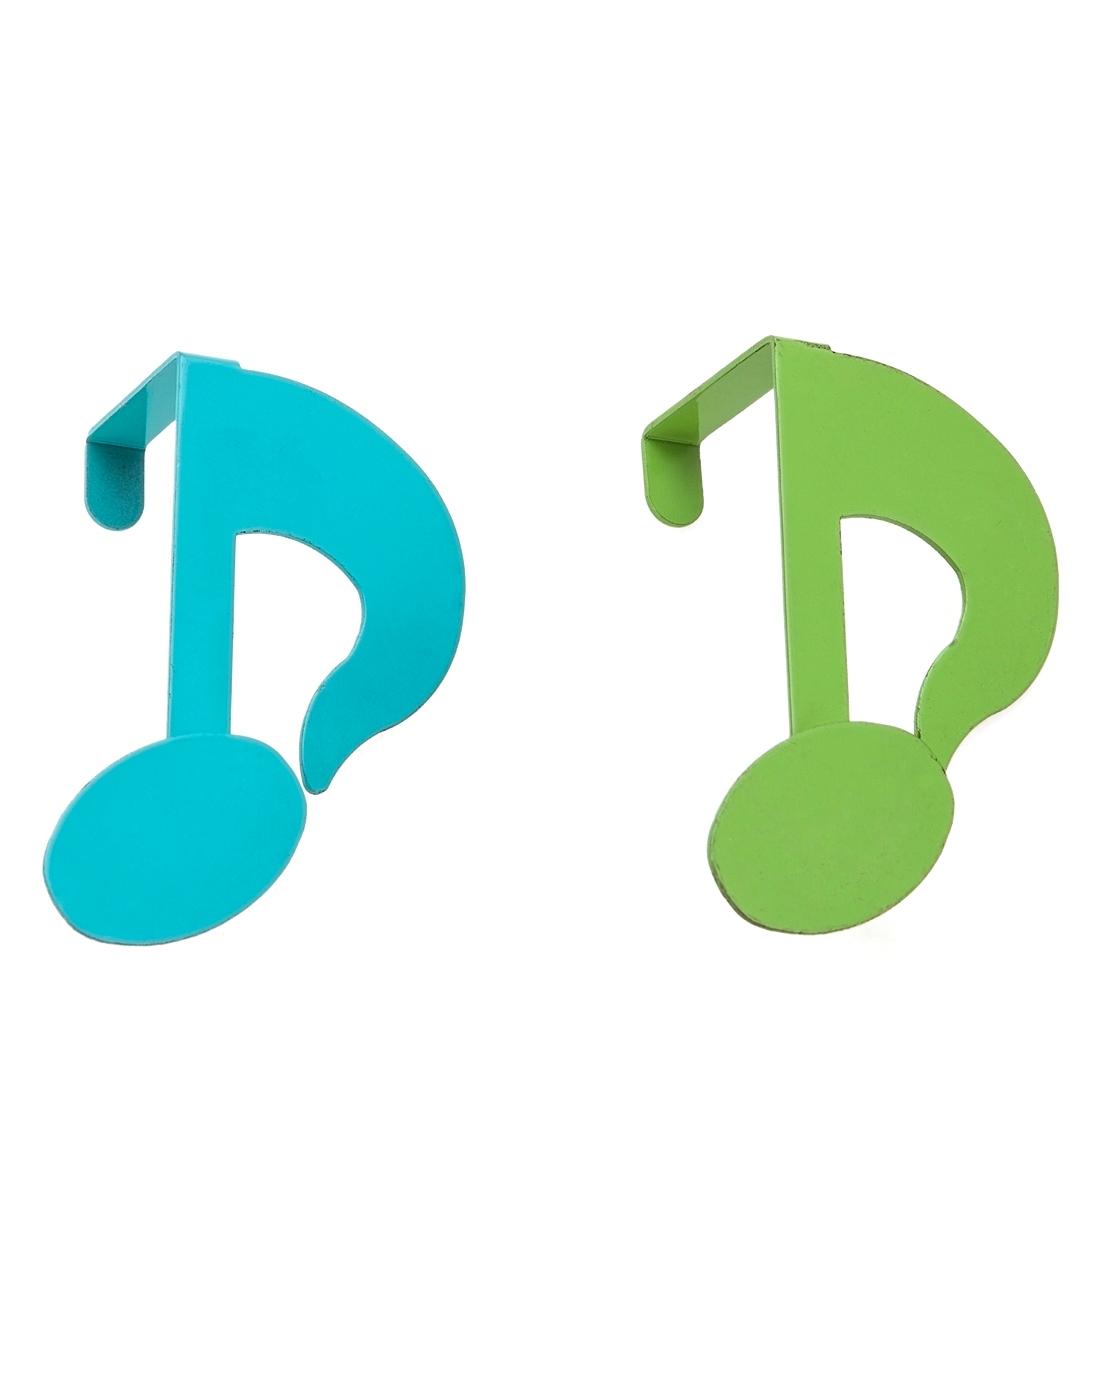 logo logo 标志 设计 矢量 矢量图 素材 图标 1100_1390 竖版 竖屏